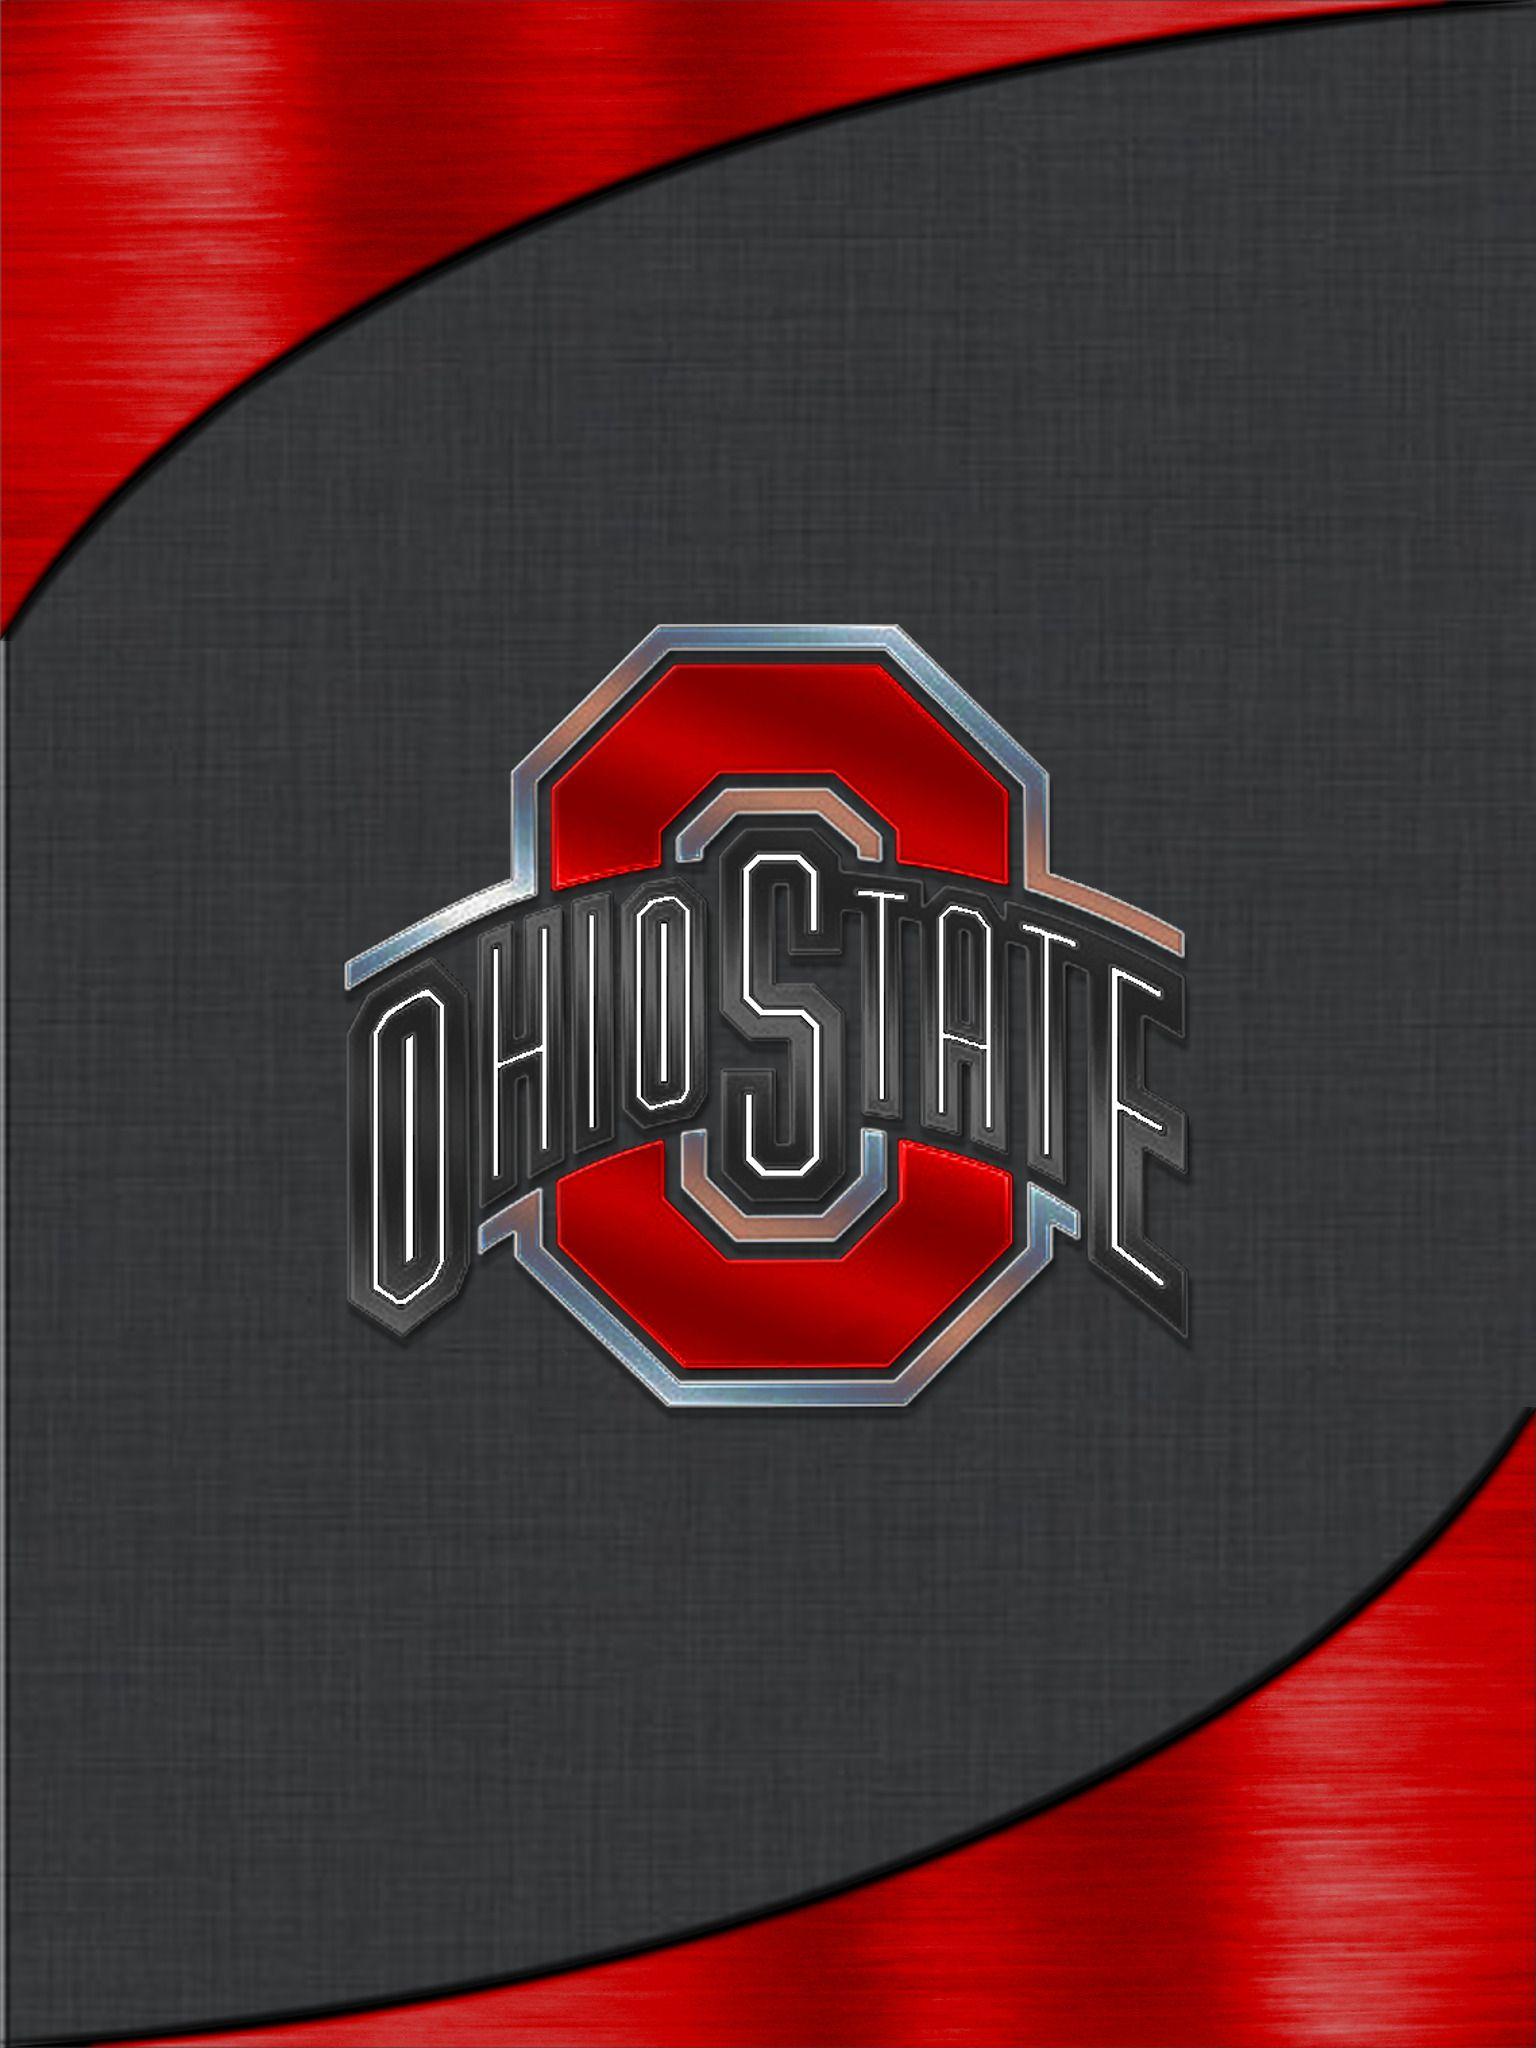 OSU ipad 2 Wallpaper 50 Ohio state buckeyes, Ohio state